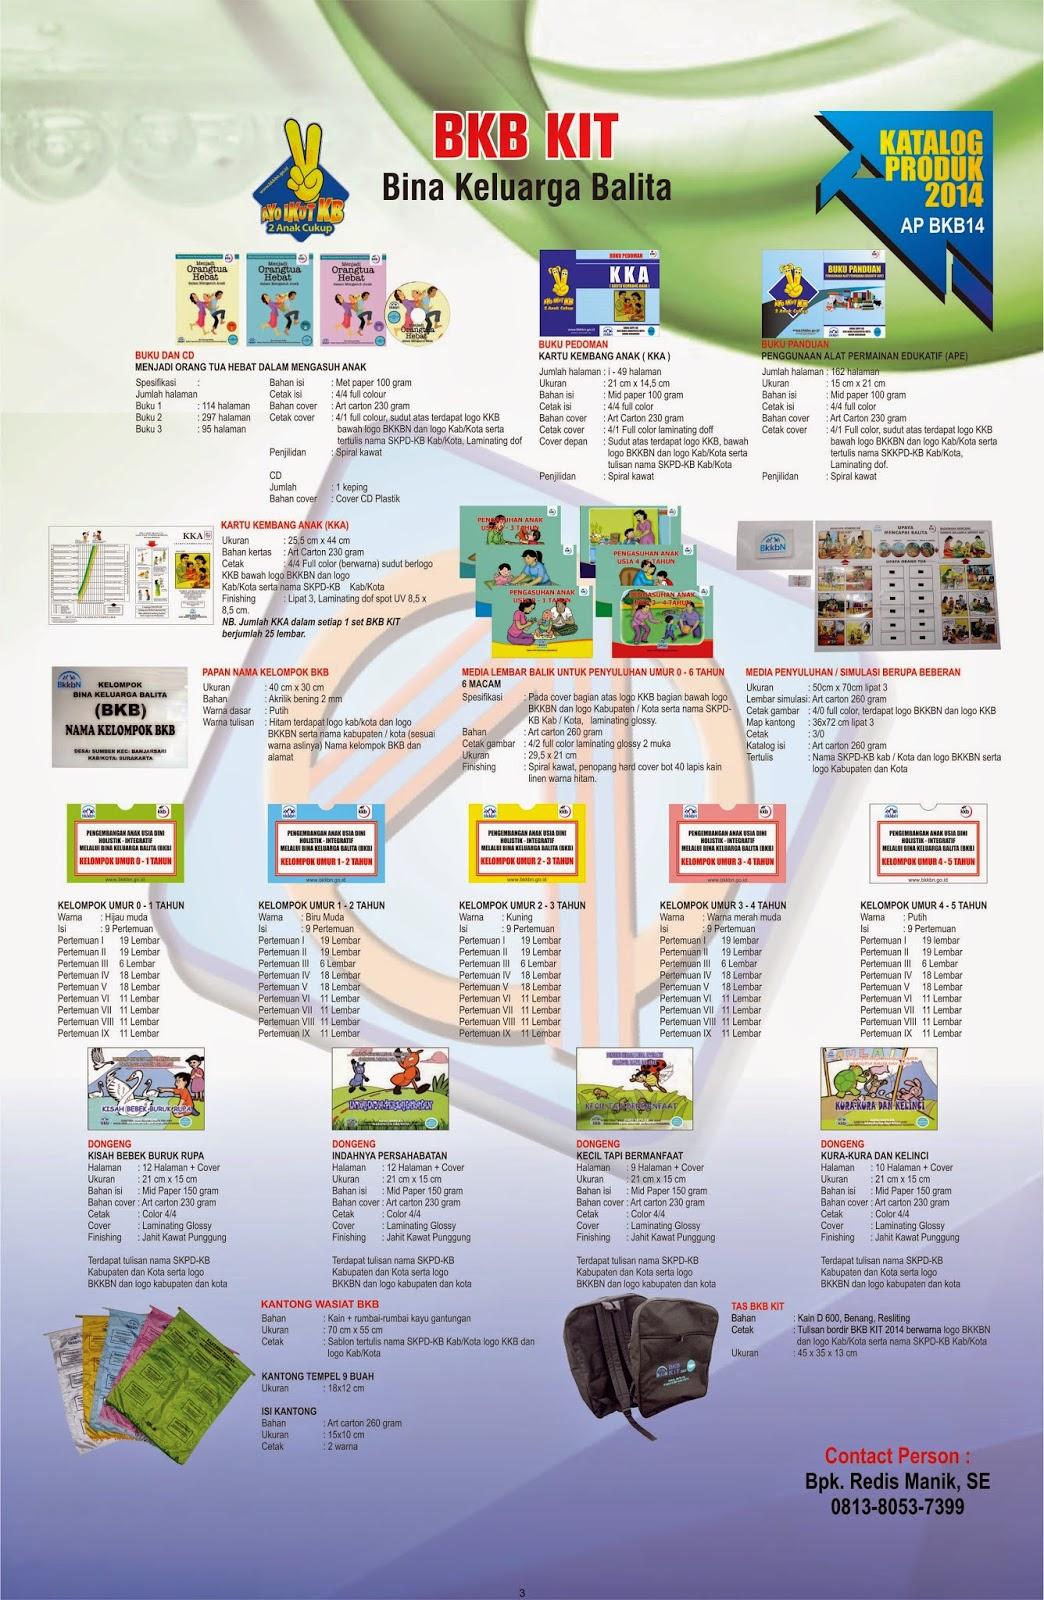 Bkb Kit Dak Bkkbn 2014 ~Rab bkb kit dak bkkbn 2014,DAK BKKBN 2014 |BKB KIT 2014,PAKET BKB KIT BKKBN 2014,BKB KIT BKKBN 2014,bkb kit bkkbn 2014~Materi Bkb Kit 2014